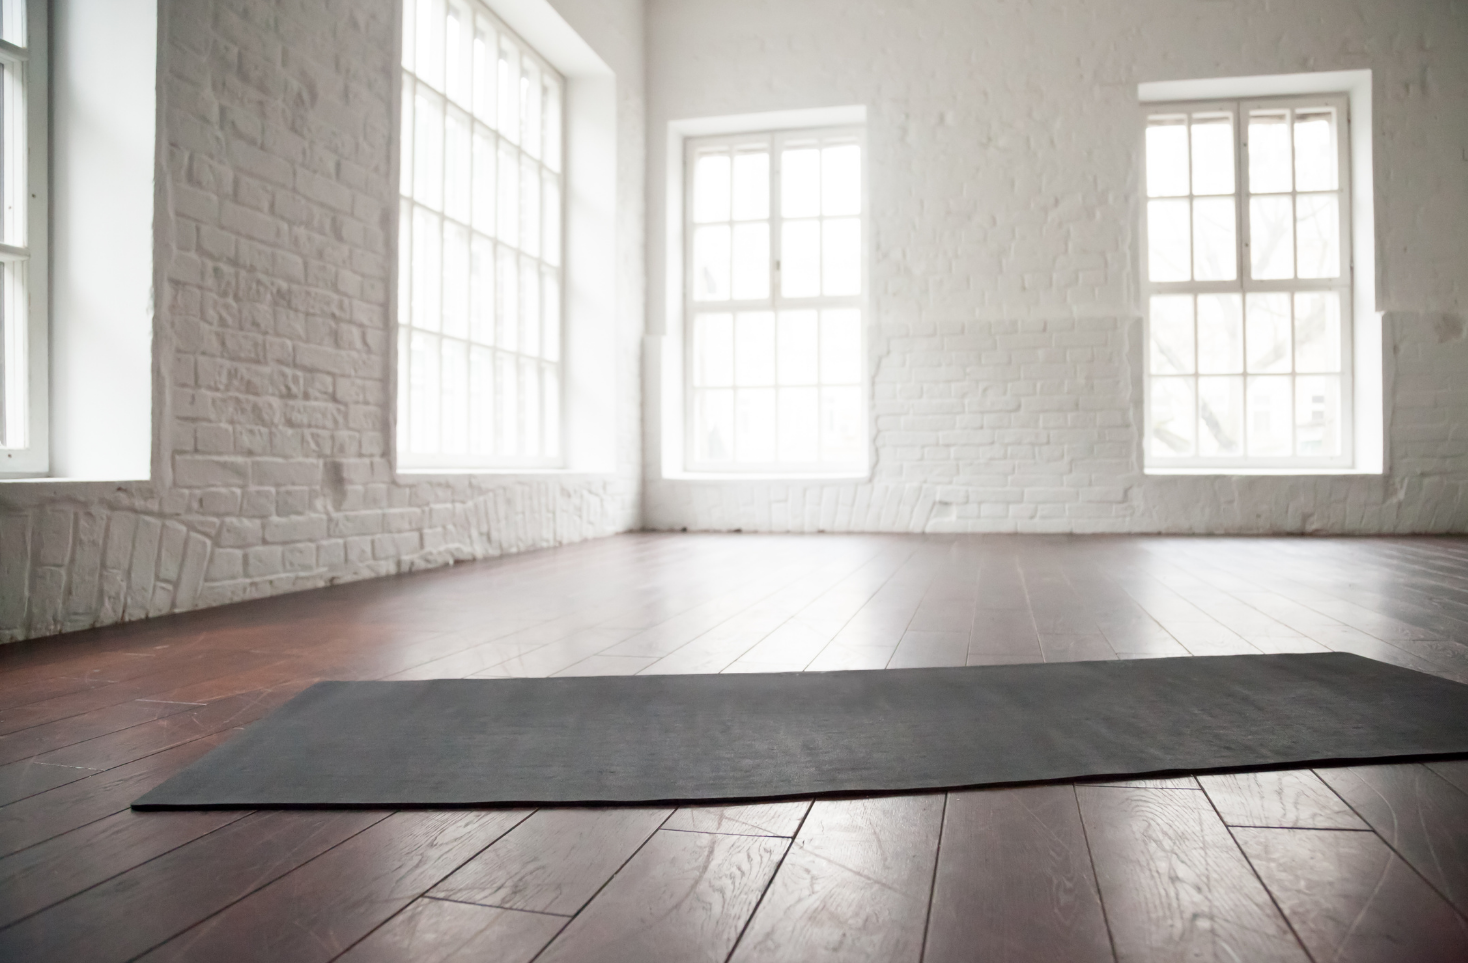 Empty yoga studio with a grey yoga mat inside.